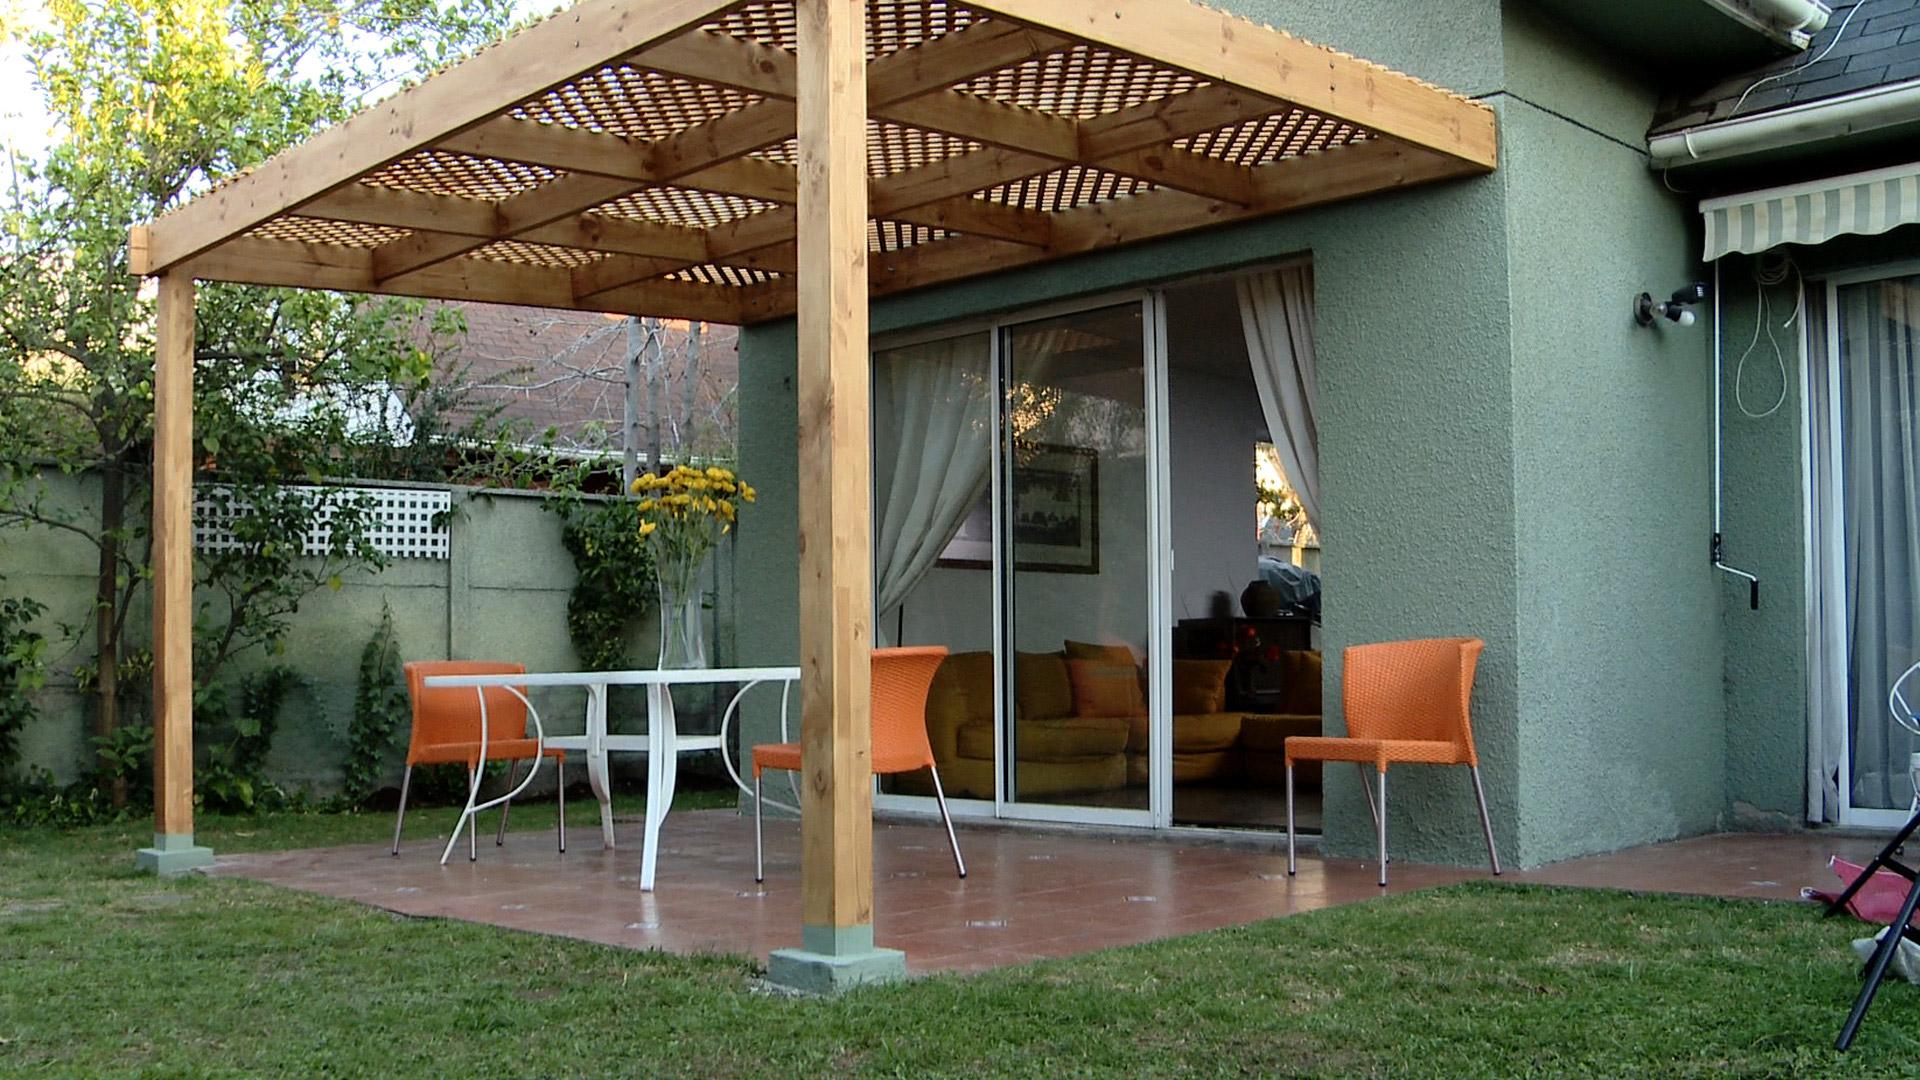 H galo usted mismo c mo construir un cobertizo de madera for Construccion de casas en terrazas